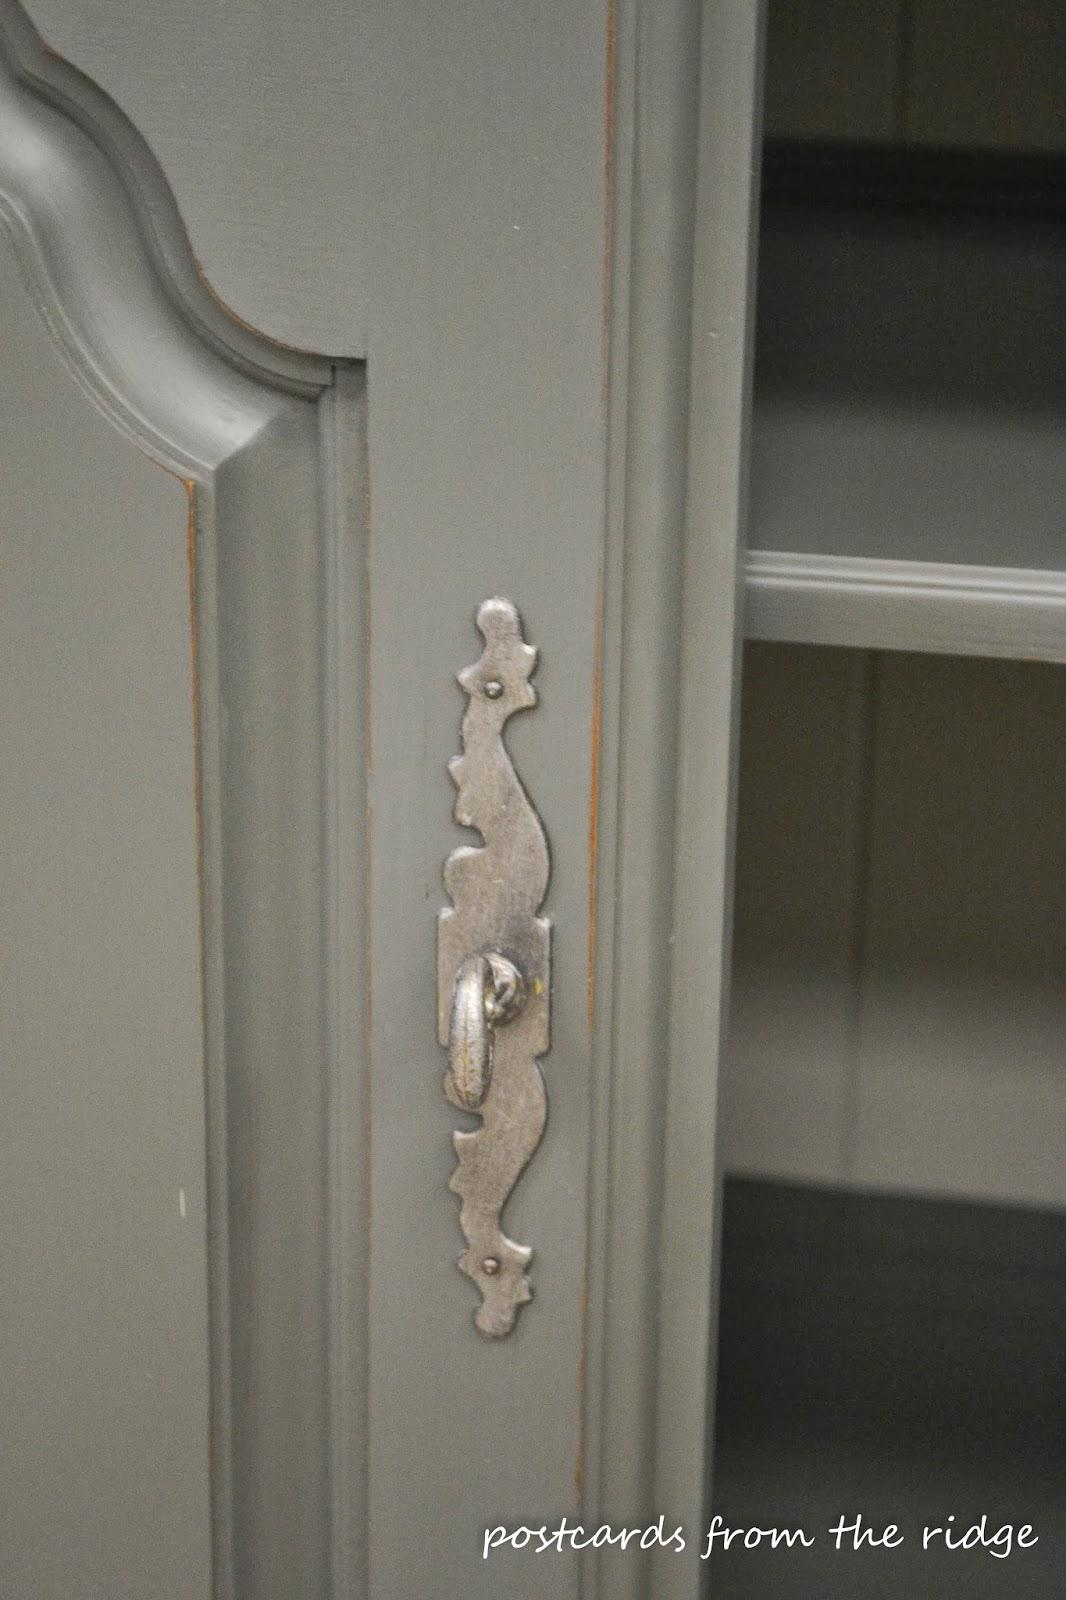 Corner cabinet painted in Benjamin Moore Ashwood Moss  #modernmasters #paintedfurniture #cornercabinet #benjaminmoore #ashwoodmoss